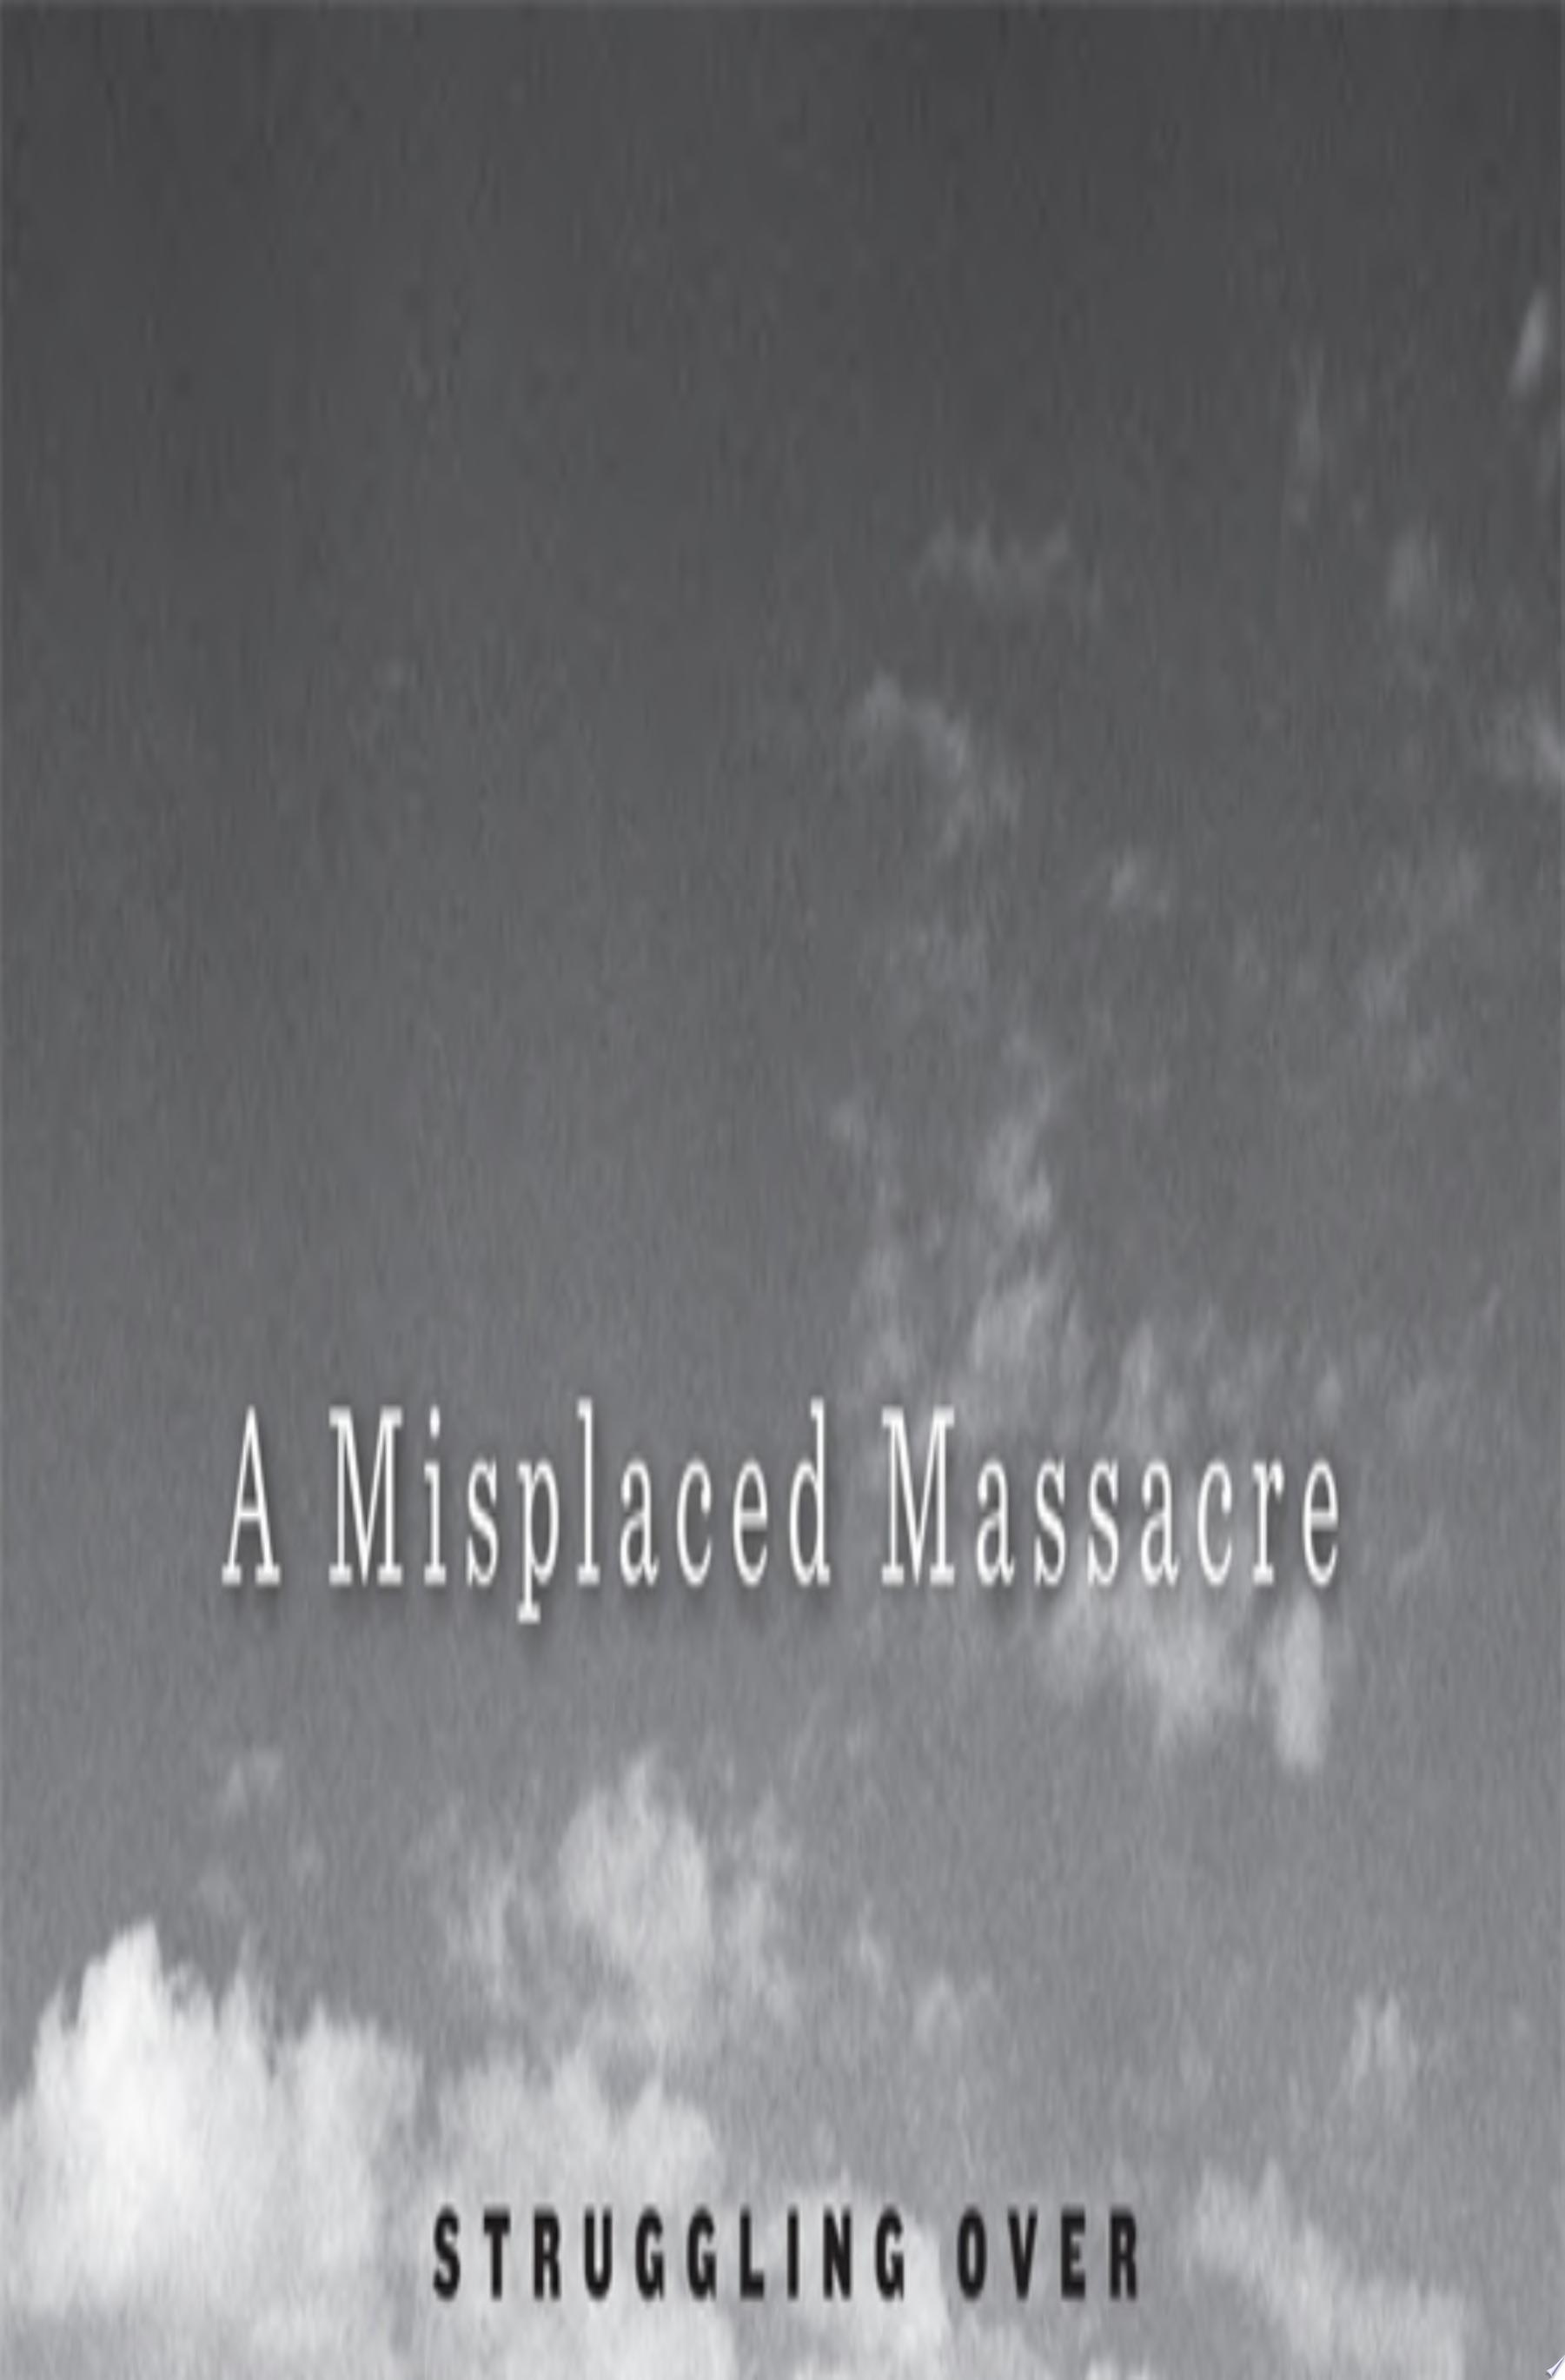 A Misplaced Massacre